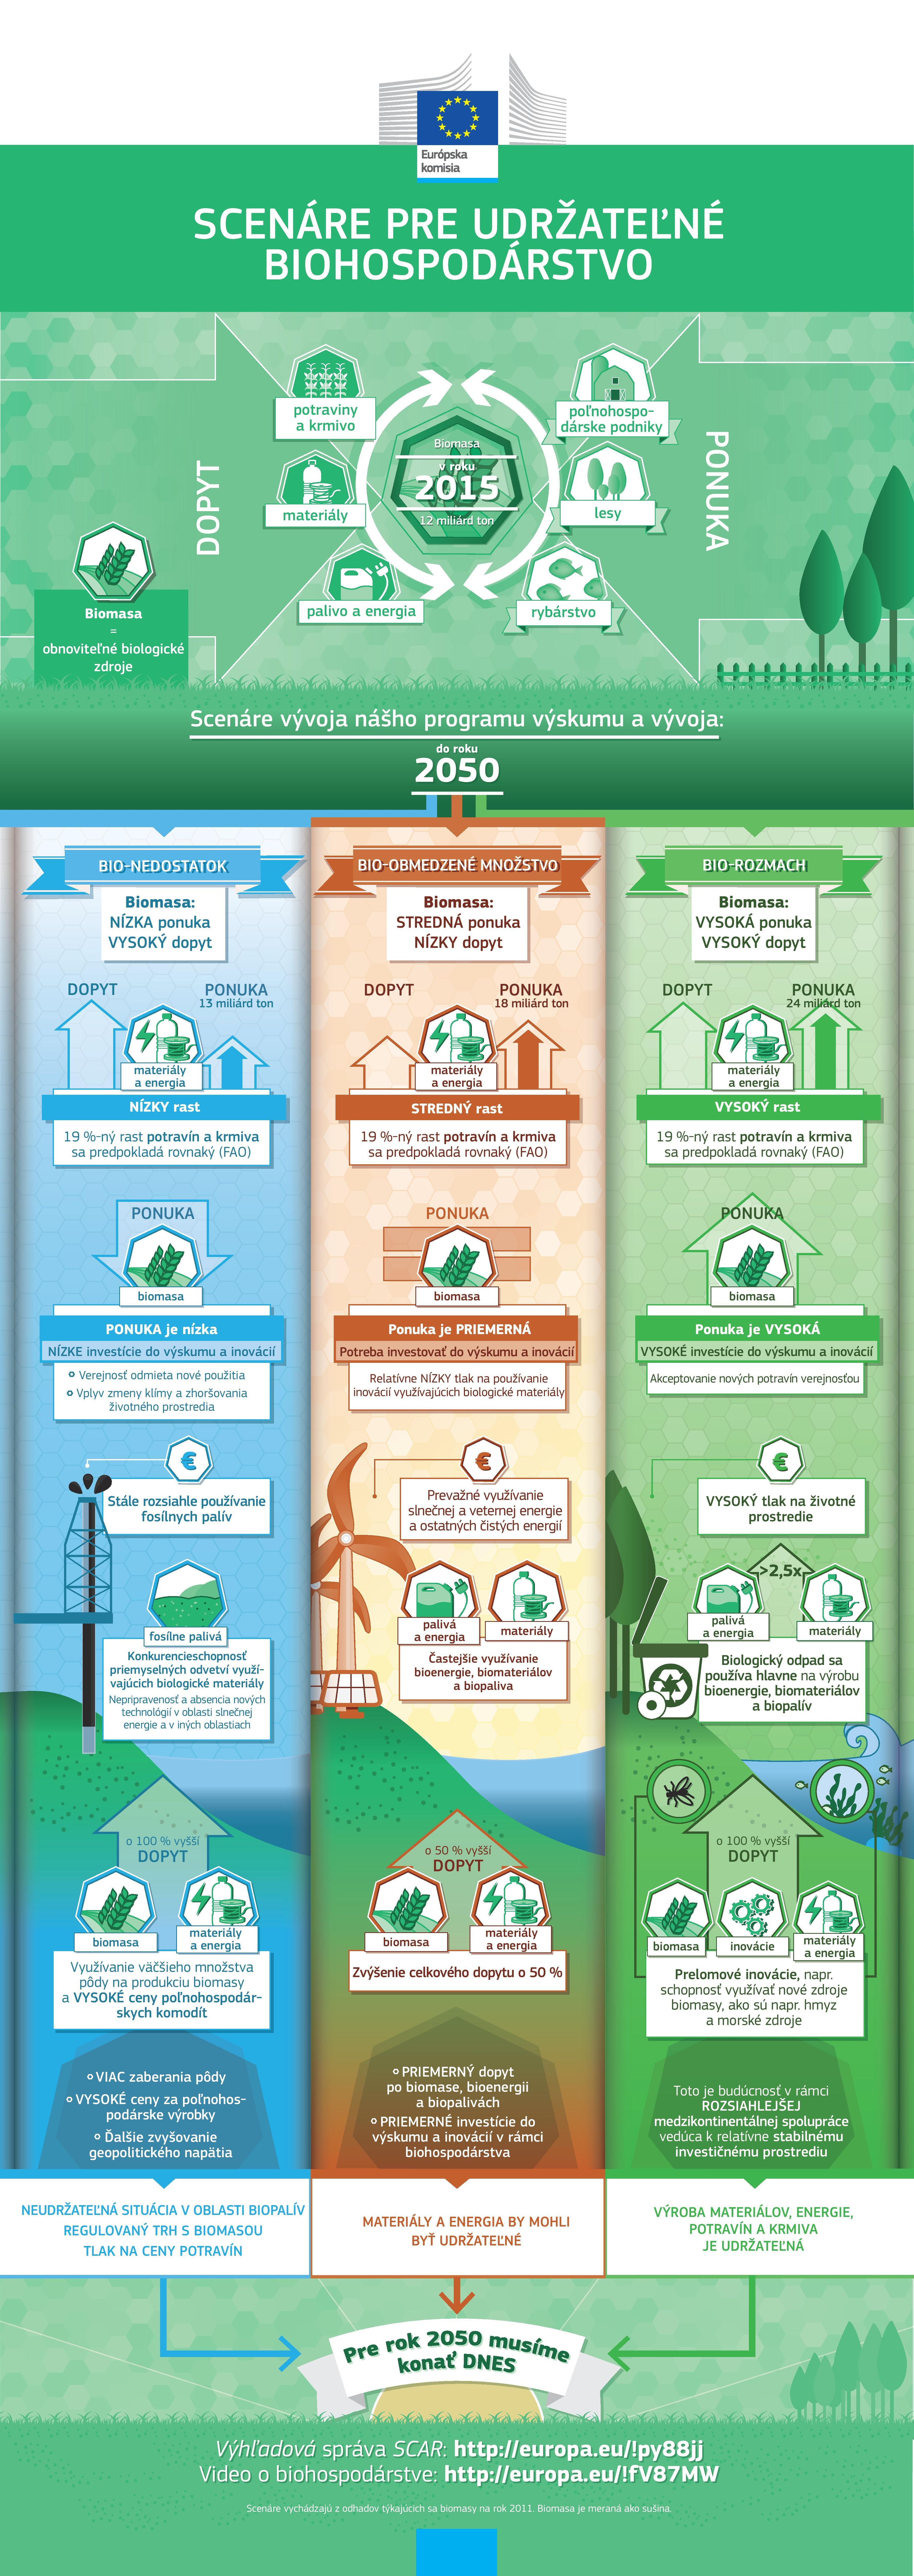 biohospodarstvo